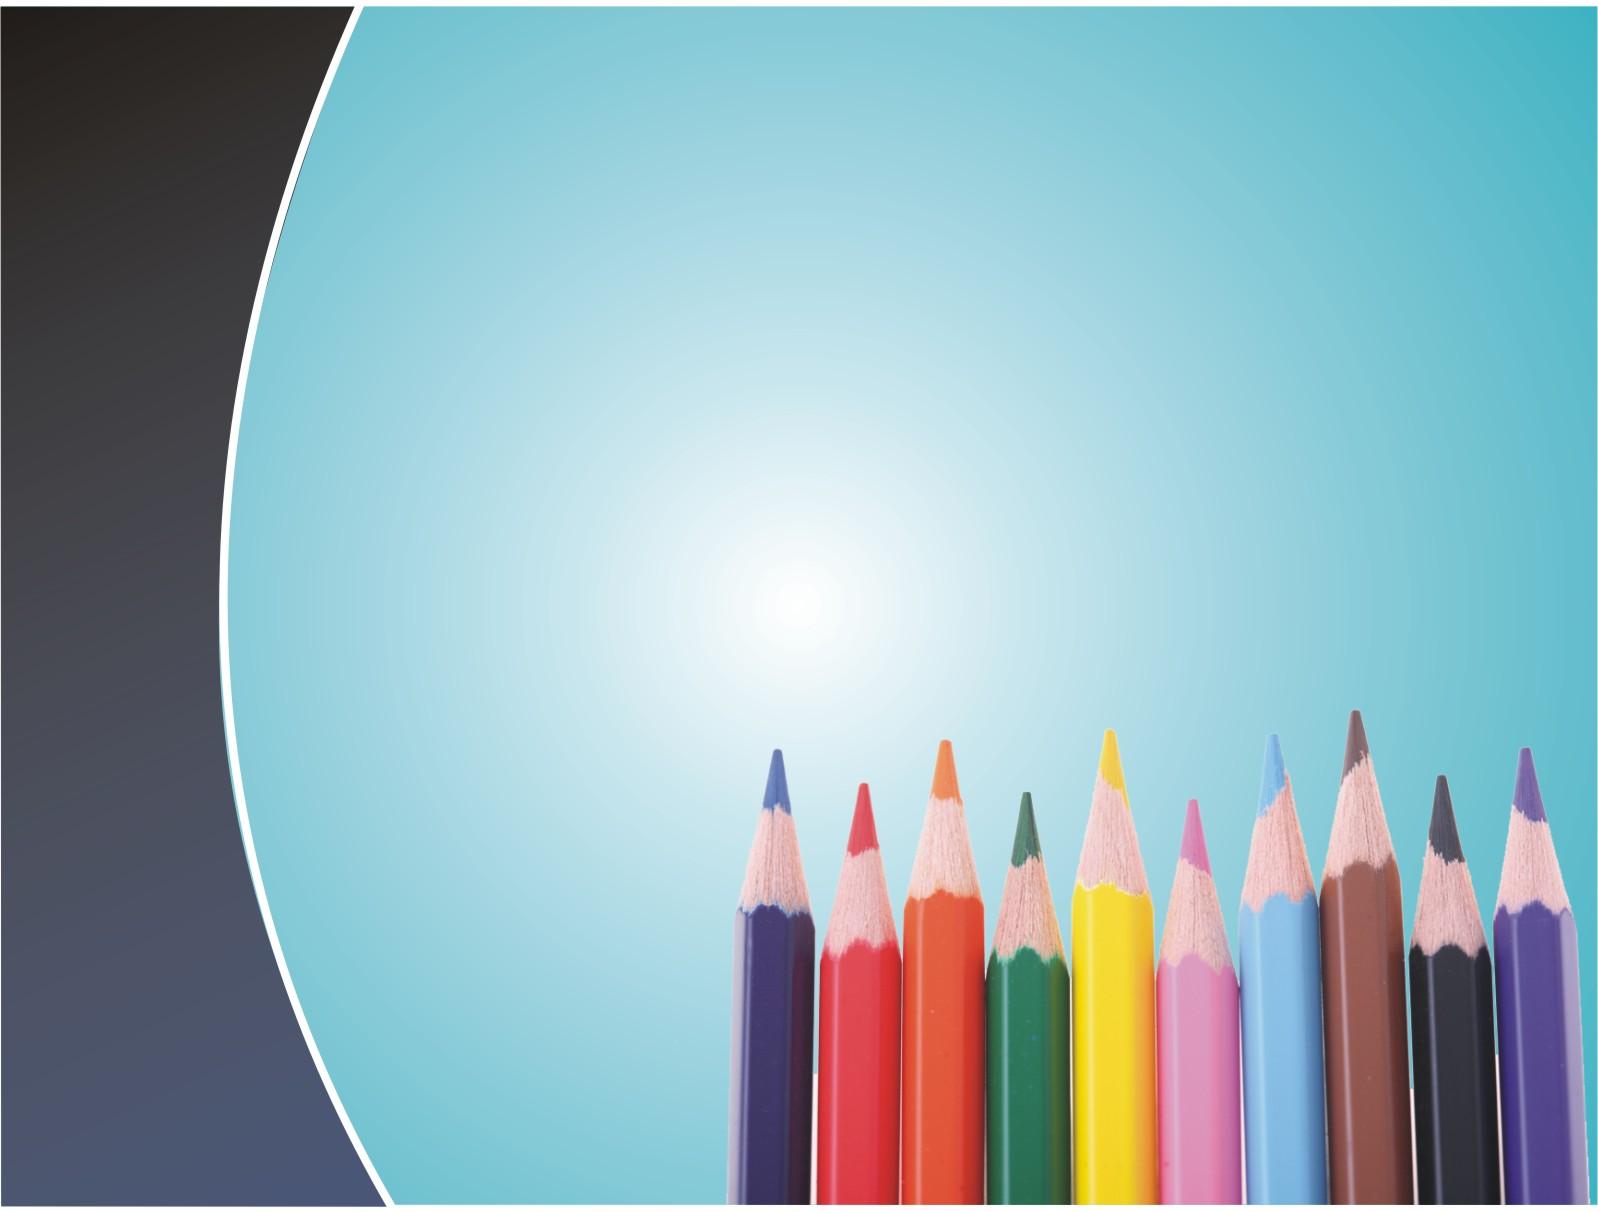 School pencils PPT Backgrounds